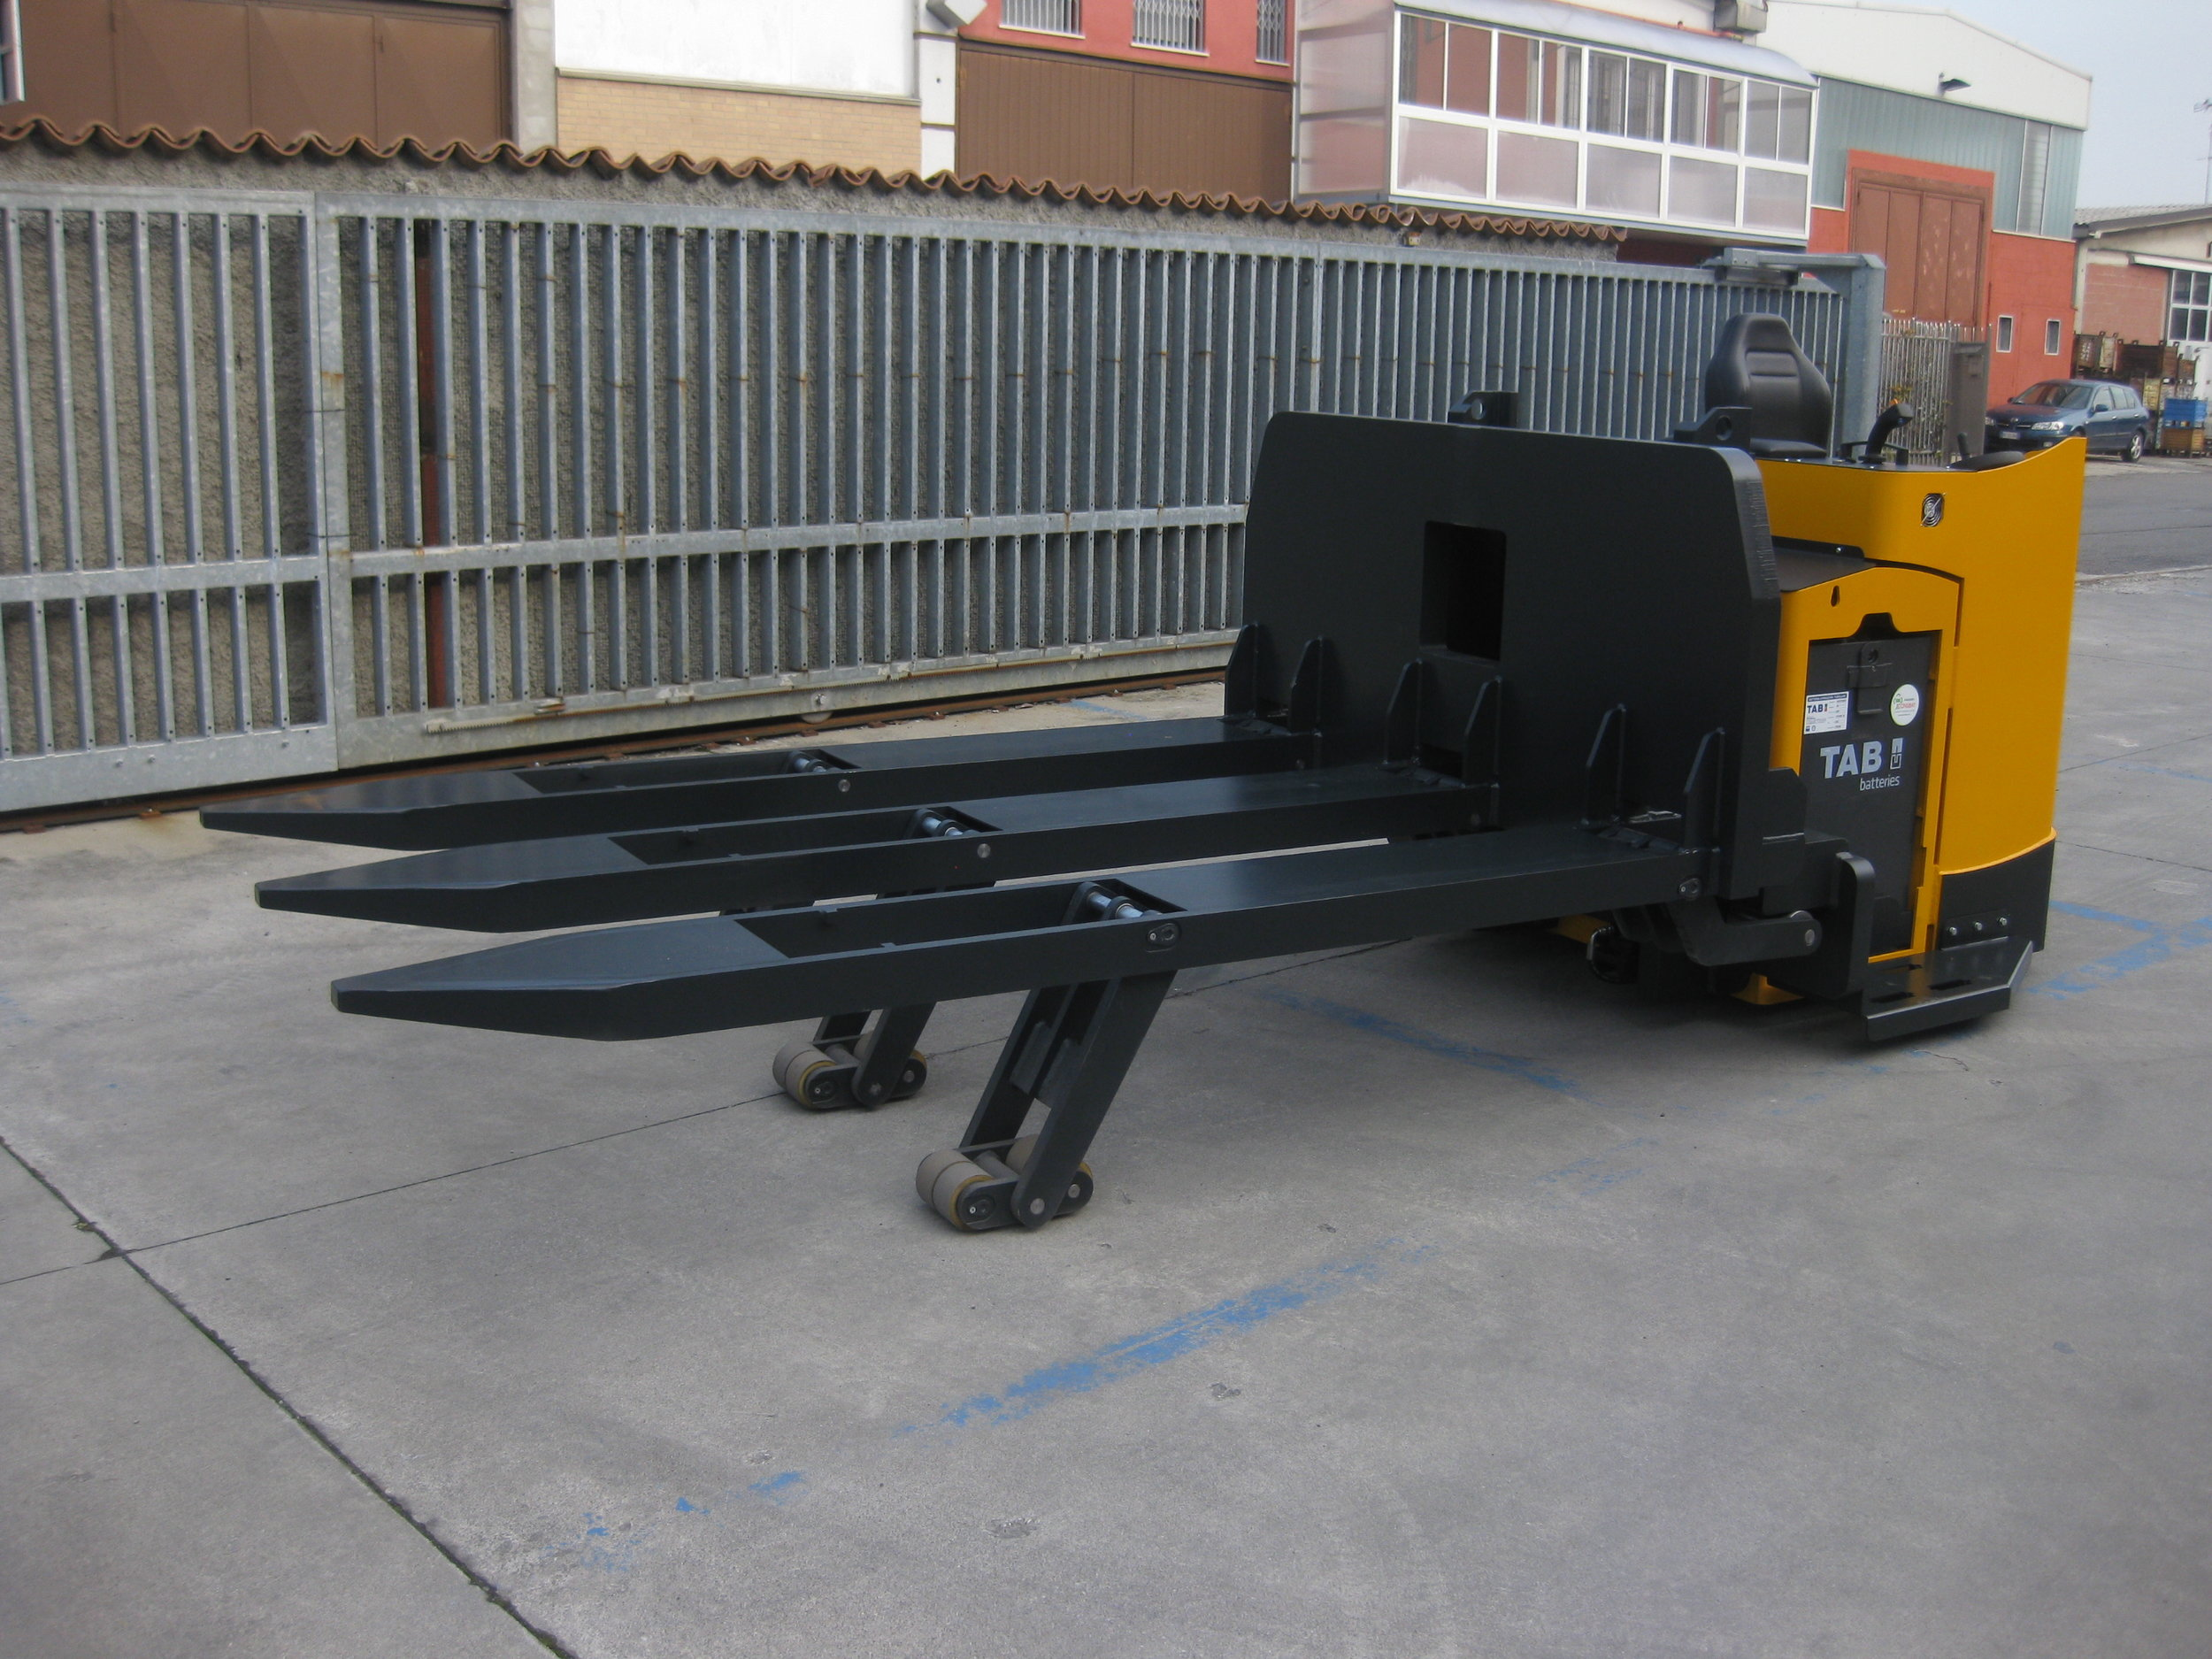 Airport Trucks  - For handling cargo loads.